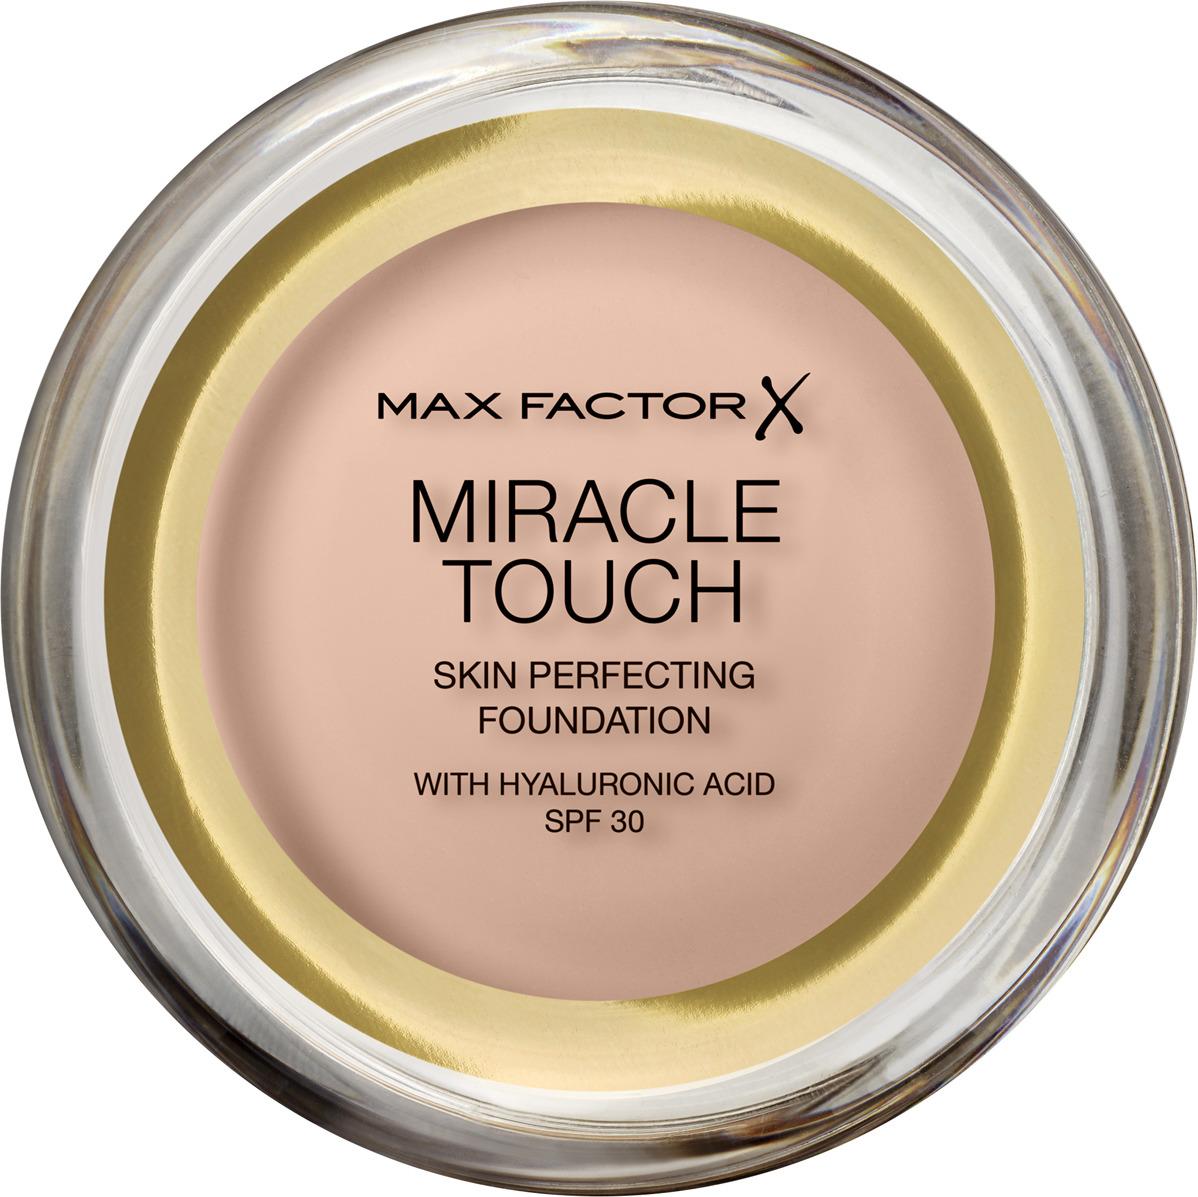 Тональная основа Max Factor Miracle Touch, SPF 30, тон 38 Light Ivory, 11 мл max factor тональная основа miracle match тон bronze 80